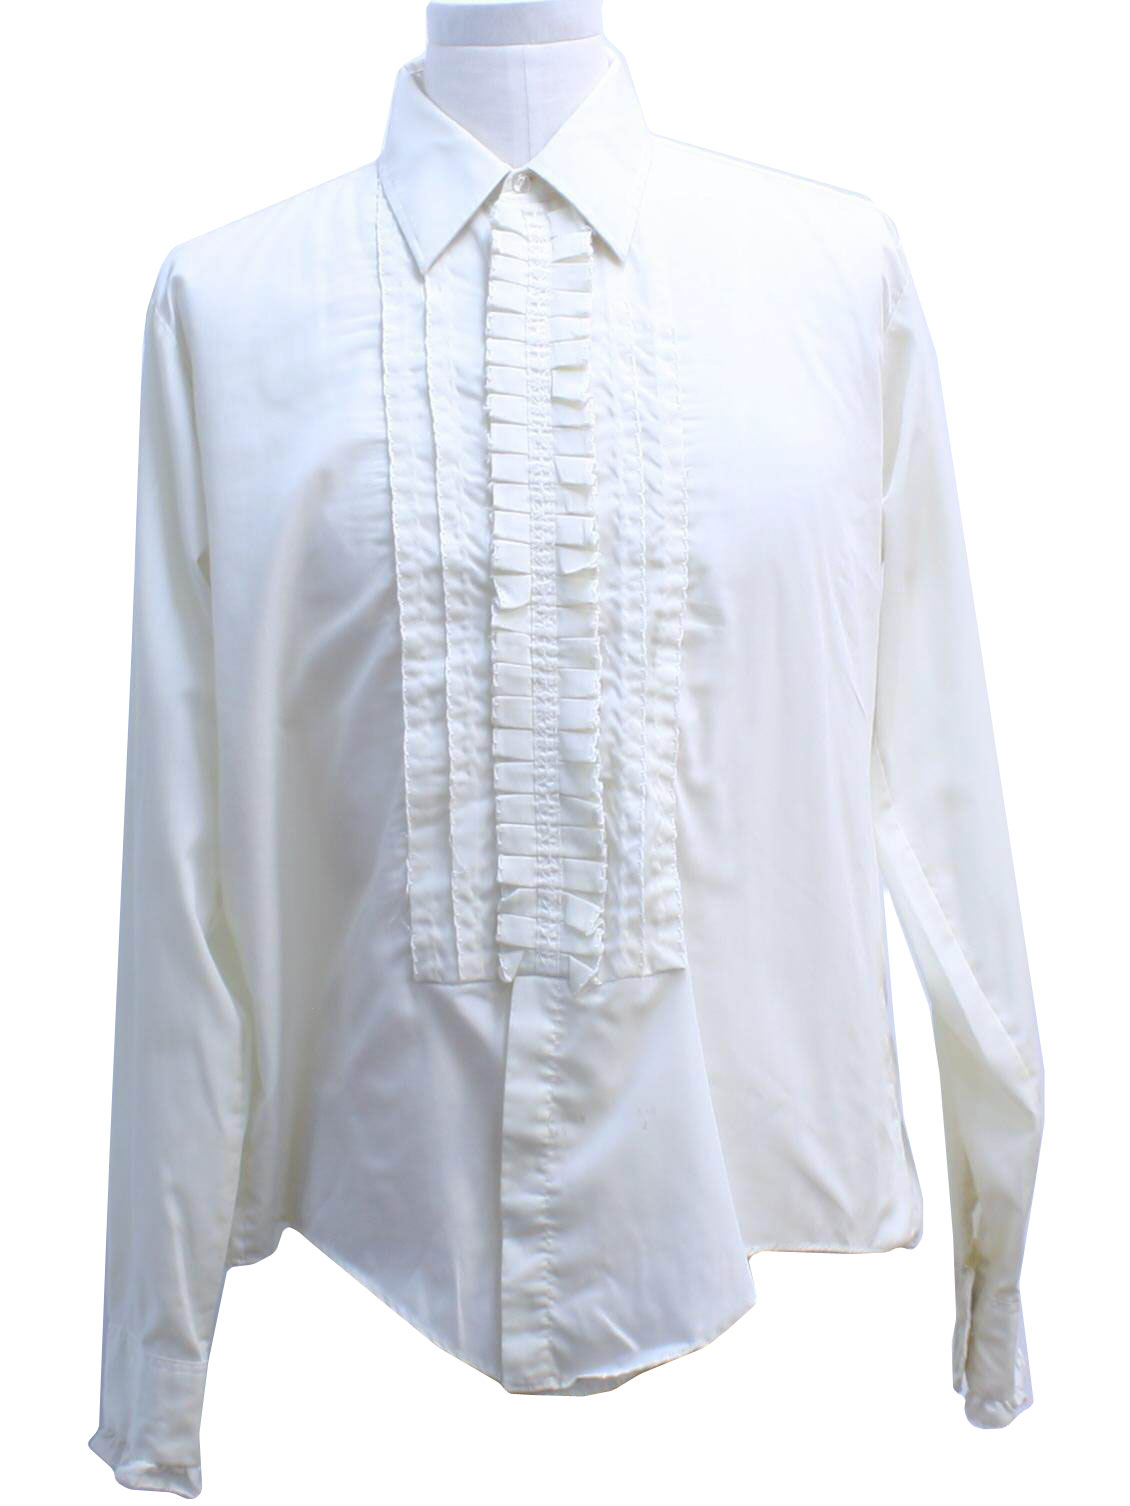 Seventies Vintage Shirt 70s Palm Beach Formals Mens Off